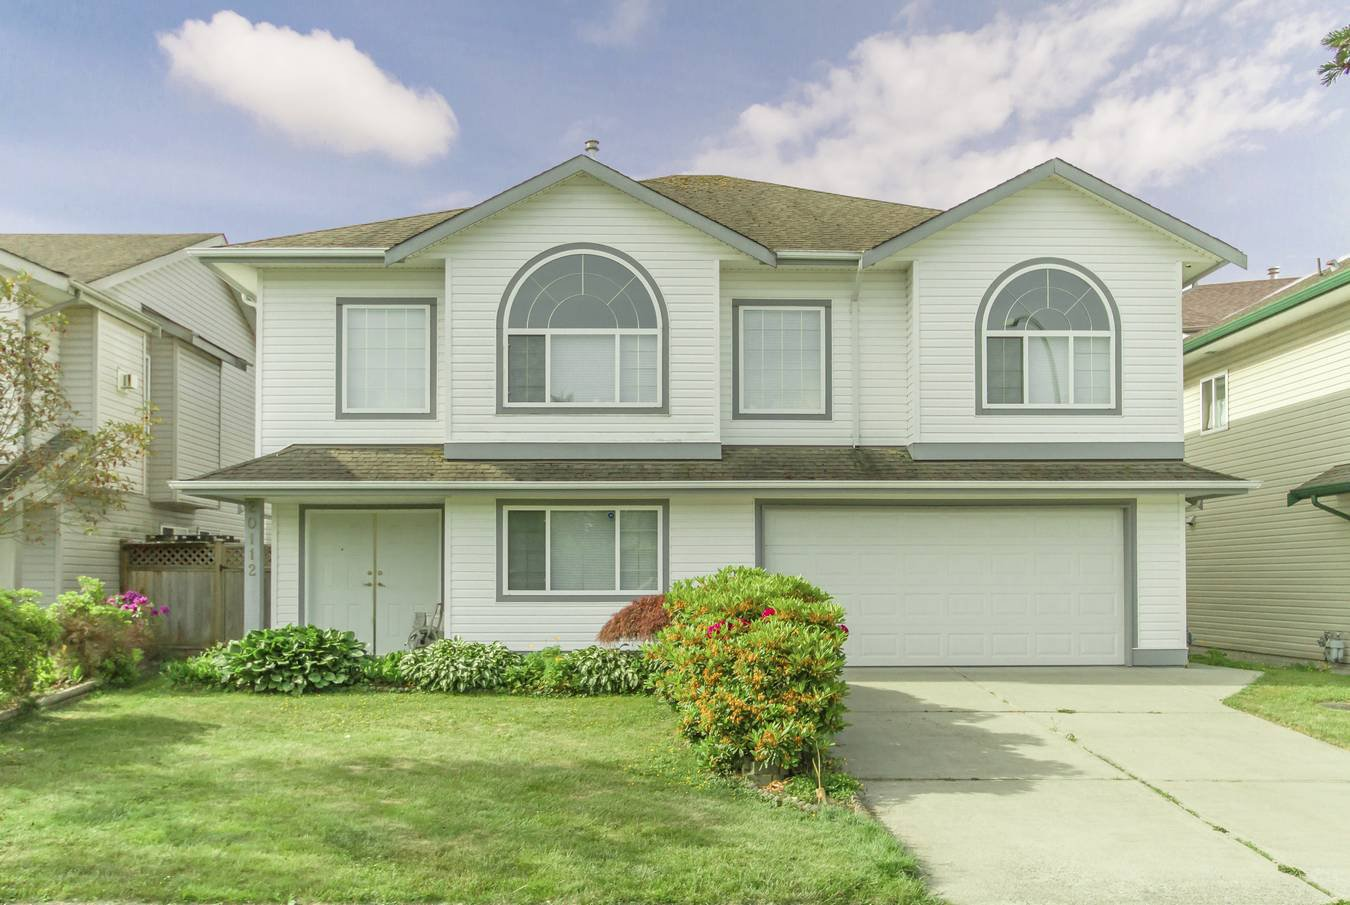 Main Photo: 20112 121 Avenue in Maple Ridge: Northwest Maple Ridge House for sale : MLS®# R2306542